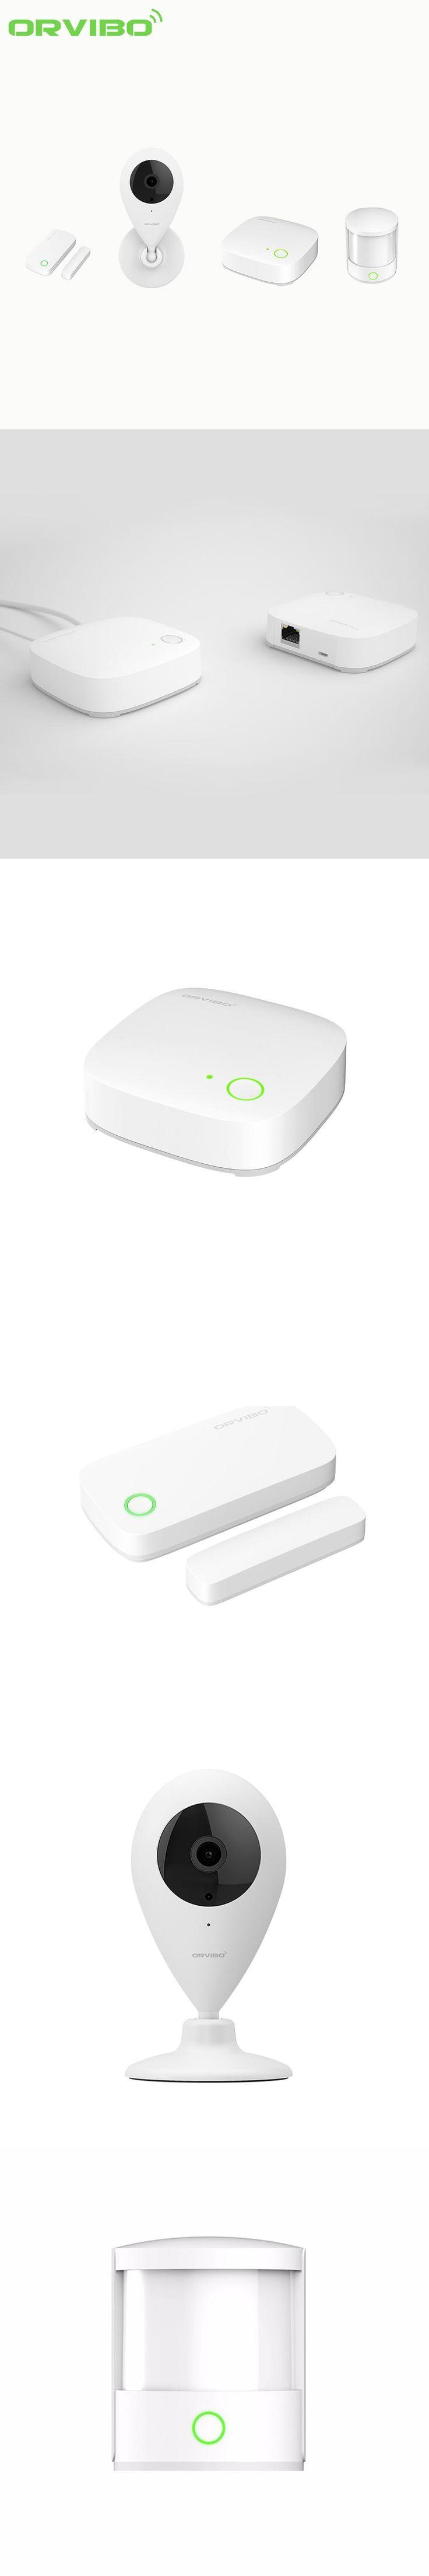 Orvibo Security Kit Smart Hub Wireless Zigbee Remote Control Motion Sensor/Door&Window Sensor Alarm Detector Wifi IP Wecam